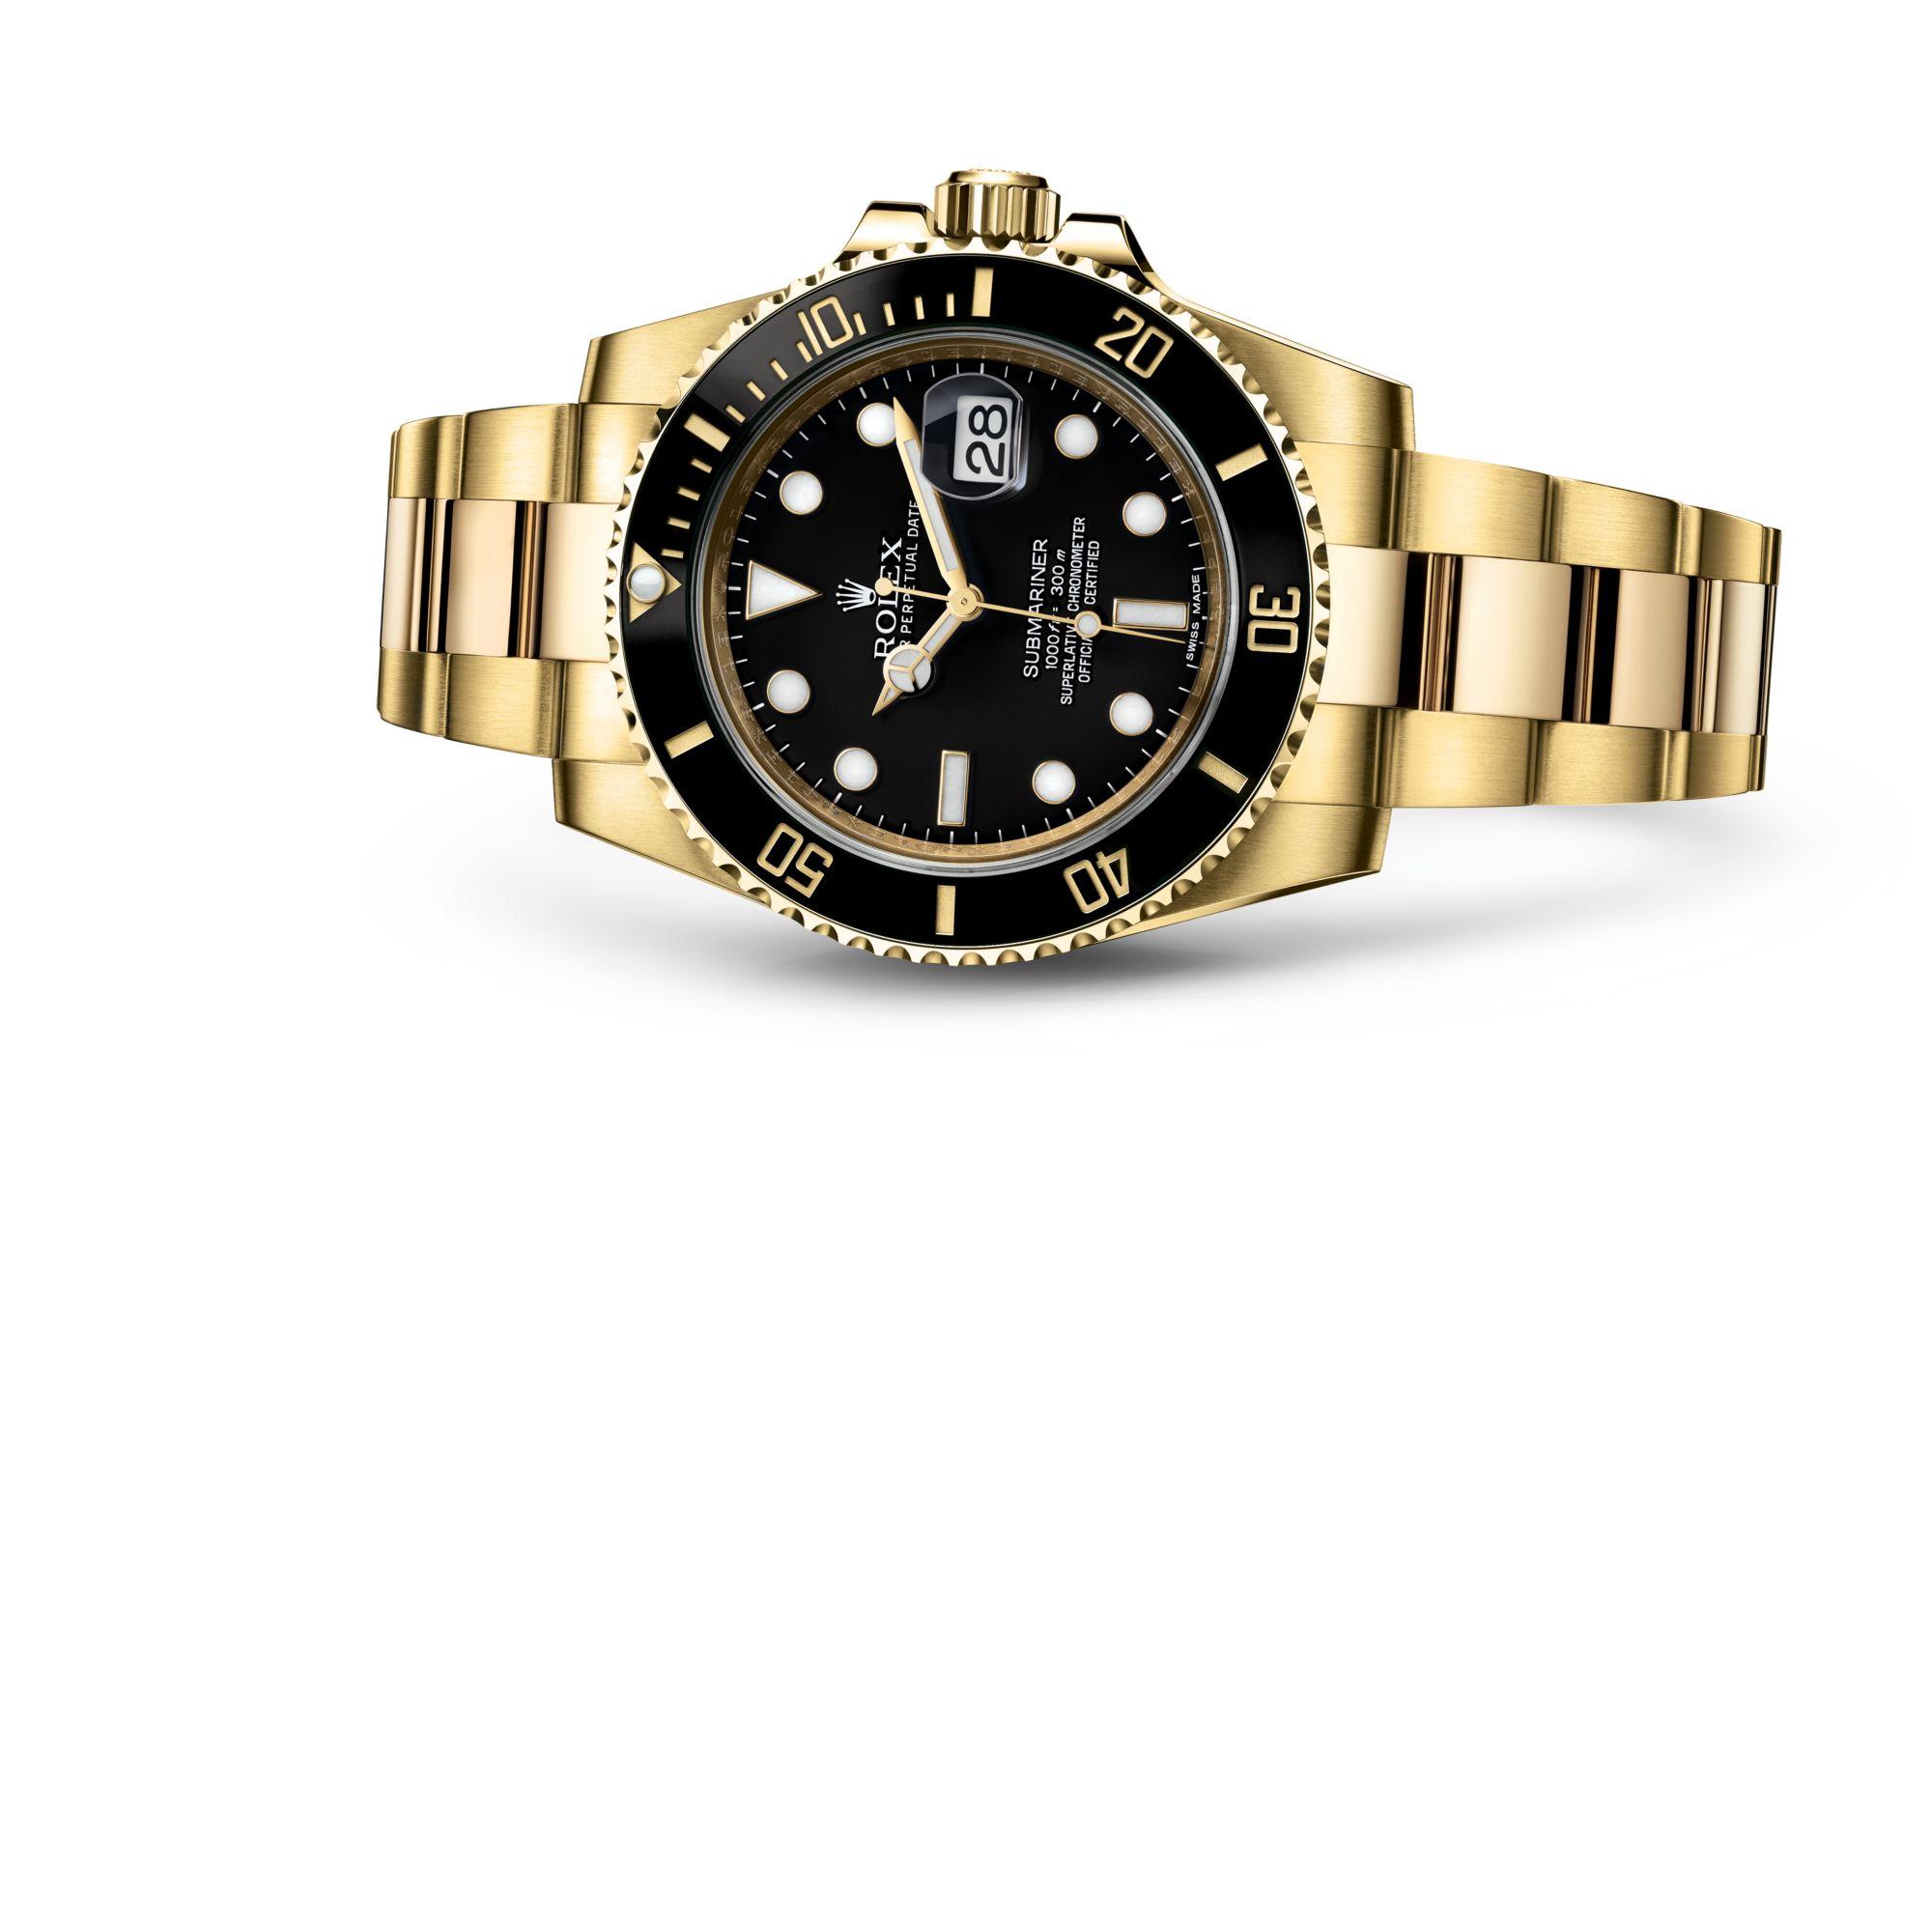 Rolex صبمارينر ديت M116618LN-0001